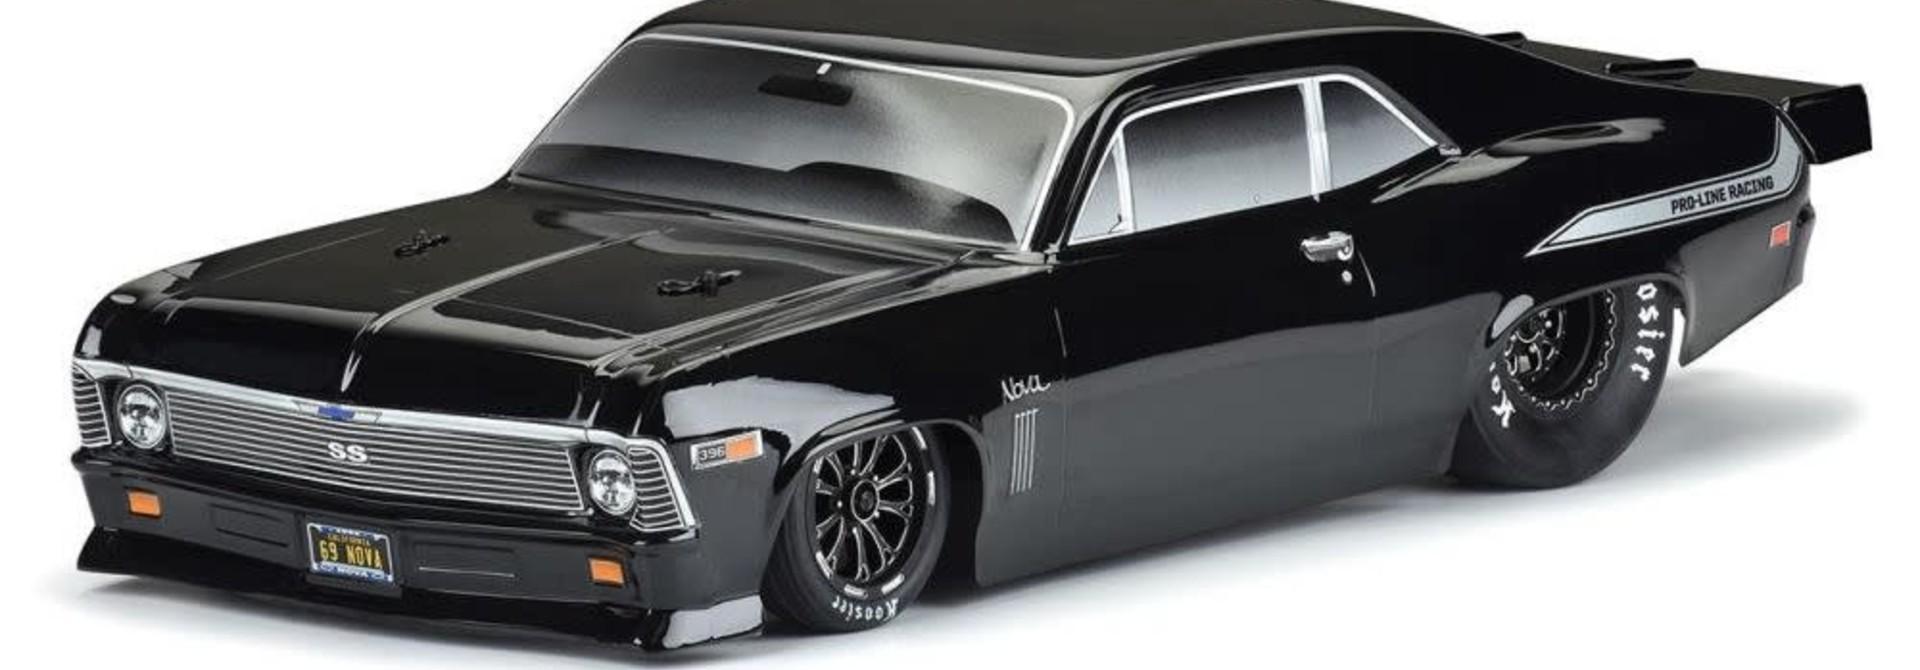 1969 Chevrolet Nova Tough-Color (Black) Body for Slash 2wd Drag Car & AE DR10